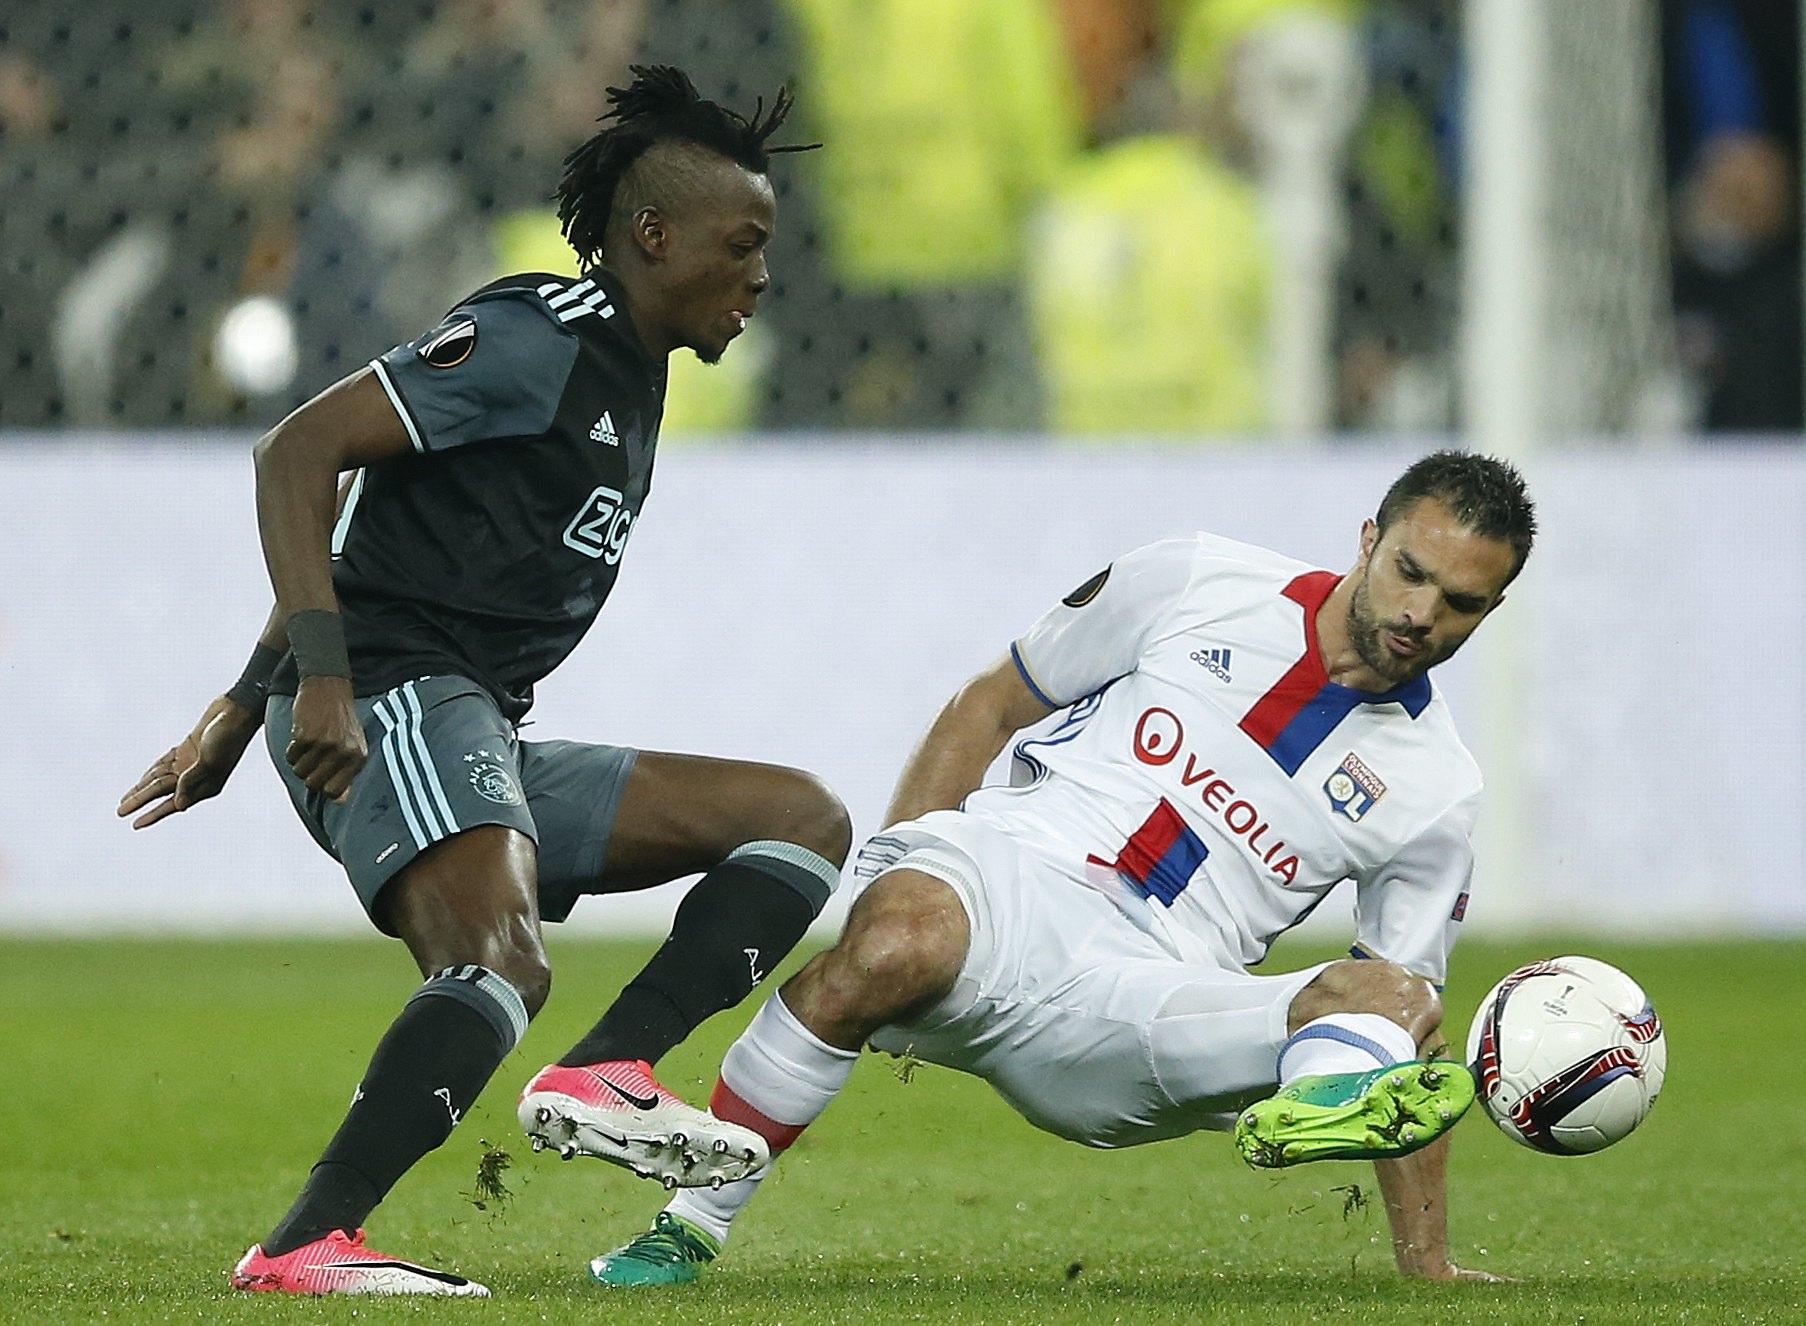 OM - Mercato : Chelsea, Kurt Zouma a déjà répondu à l'OL